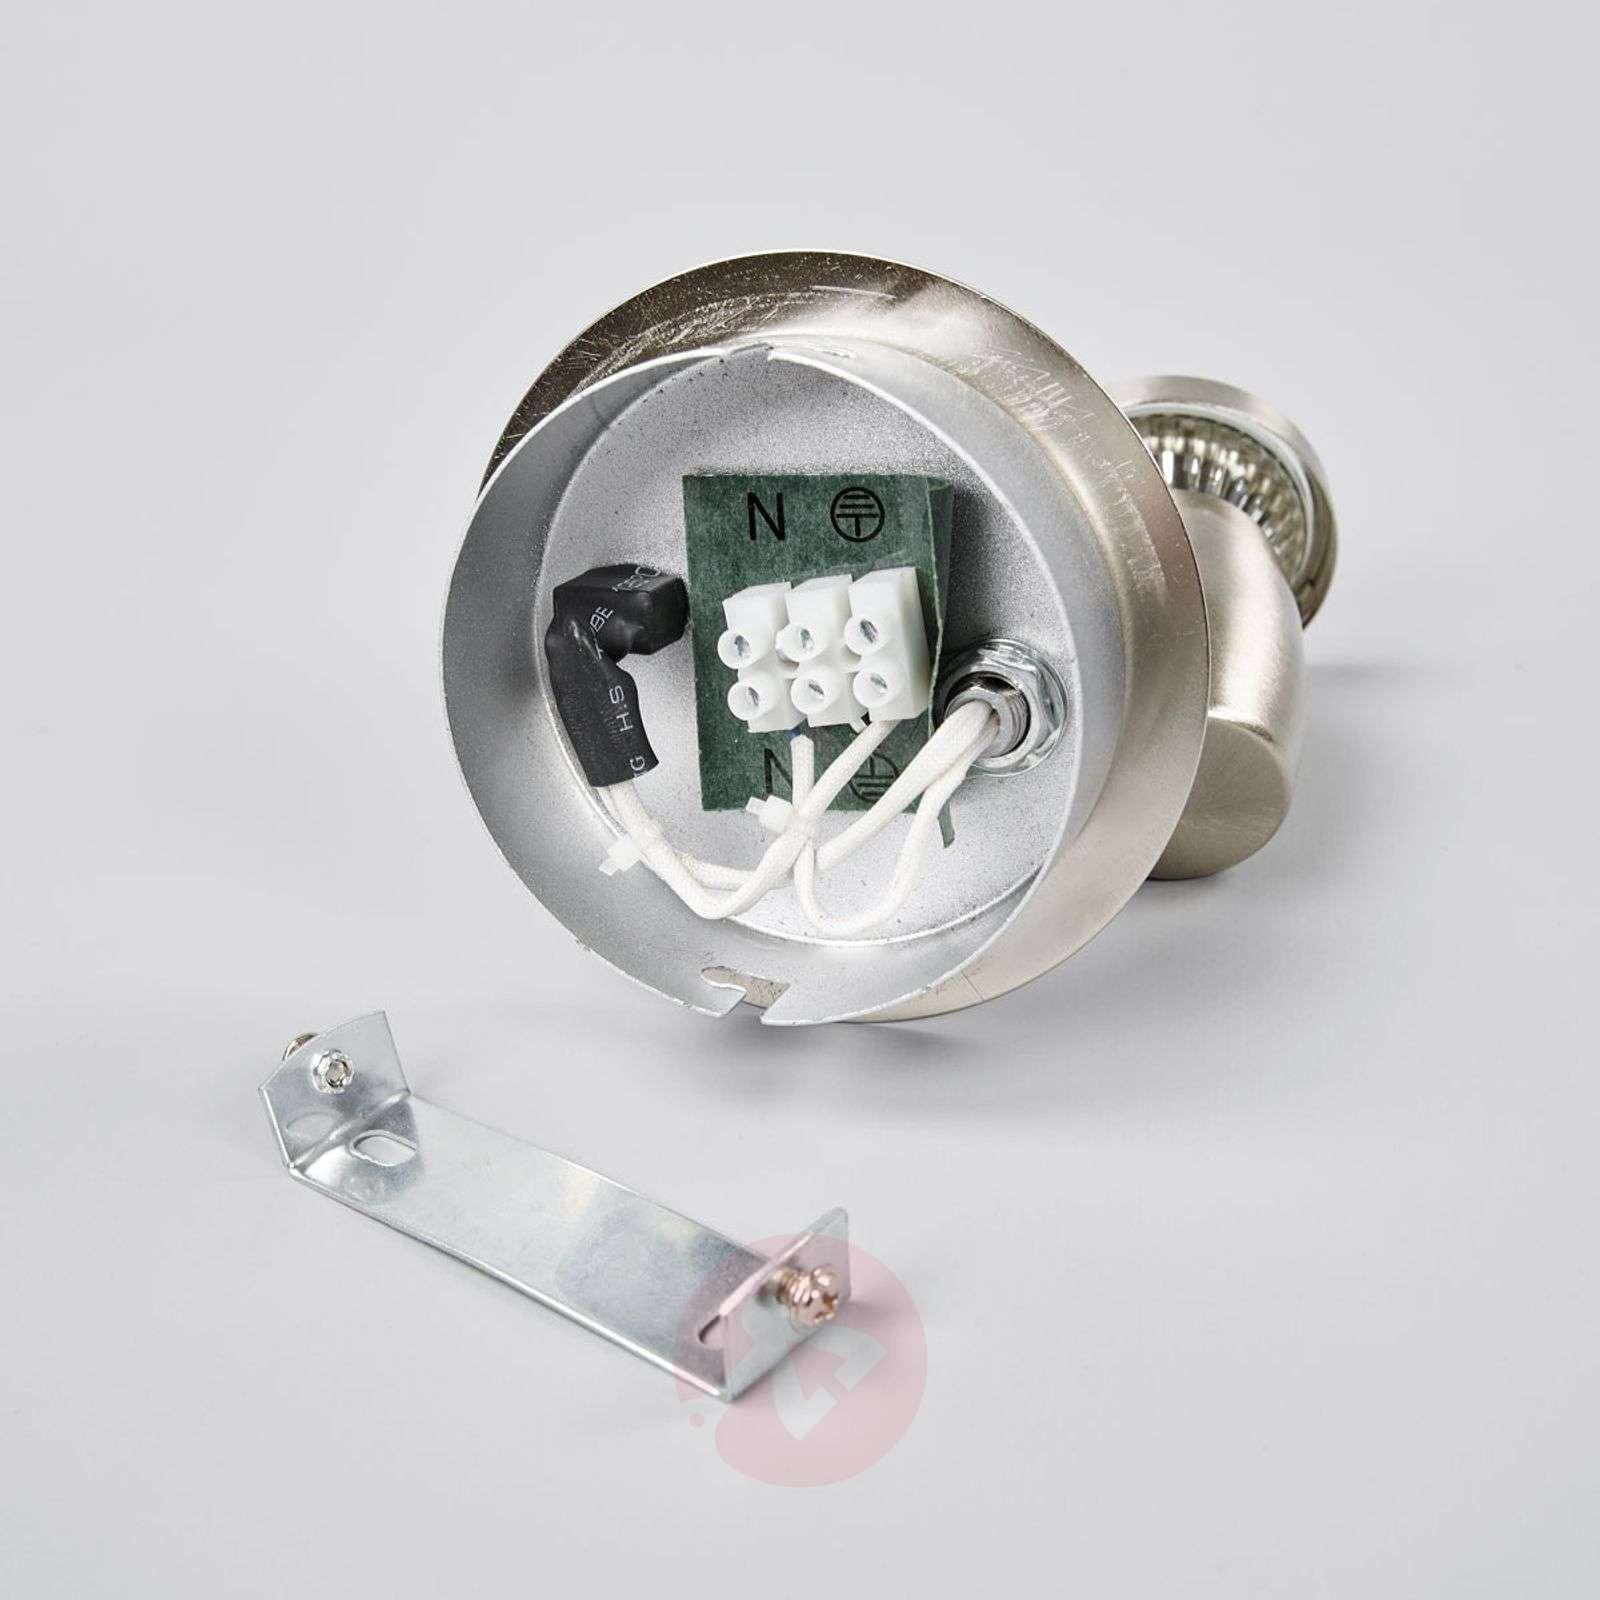 Nikkelöity LED-seinäkohdevalaisin Celestine-9954017-02